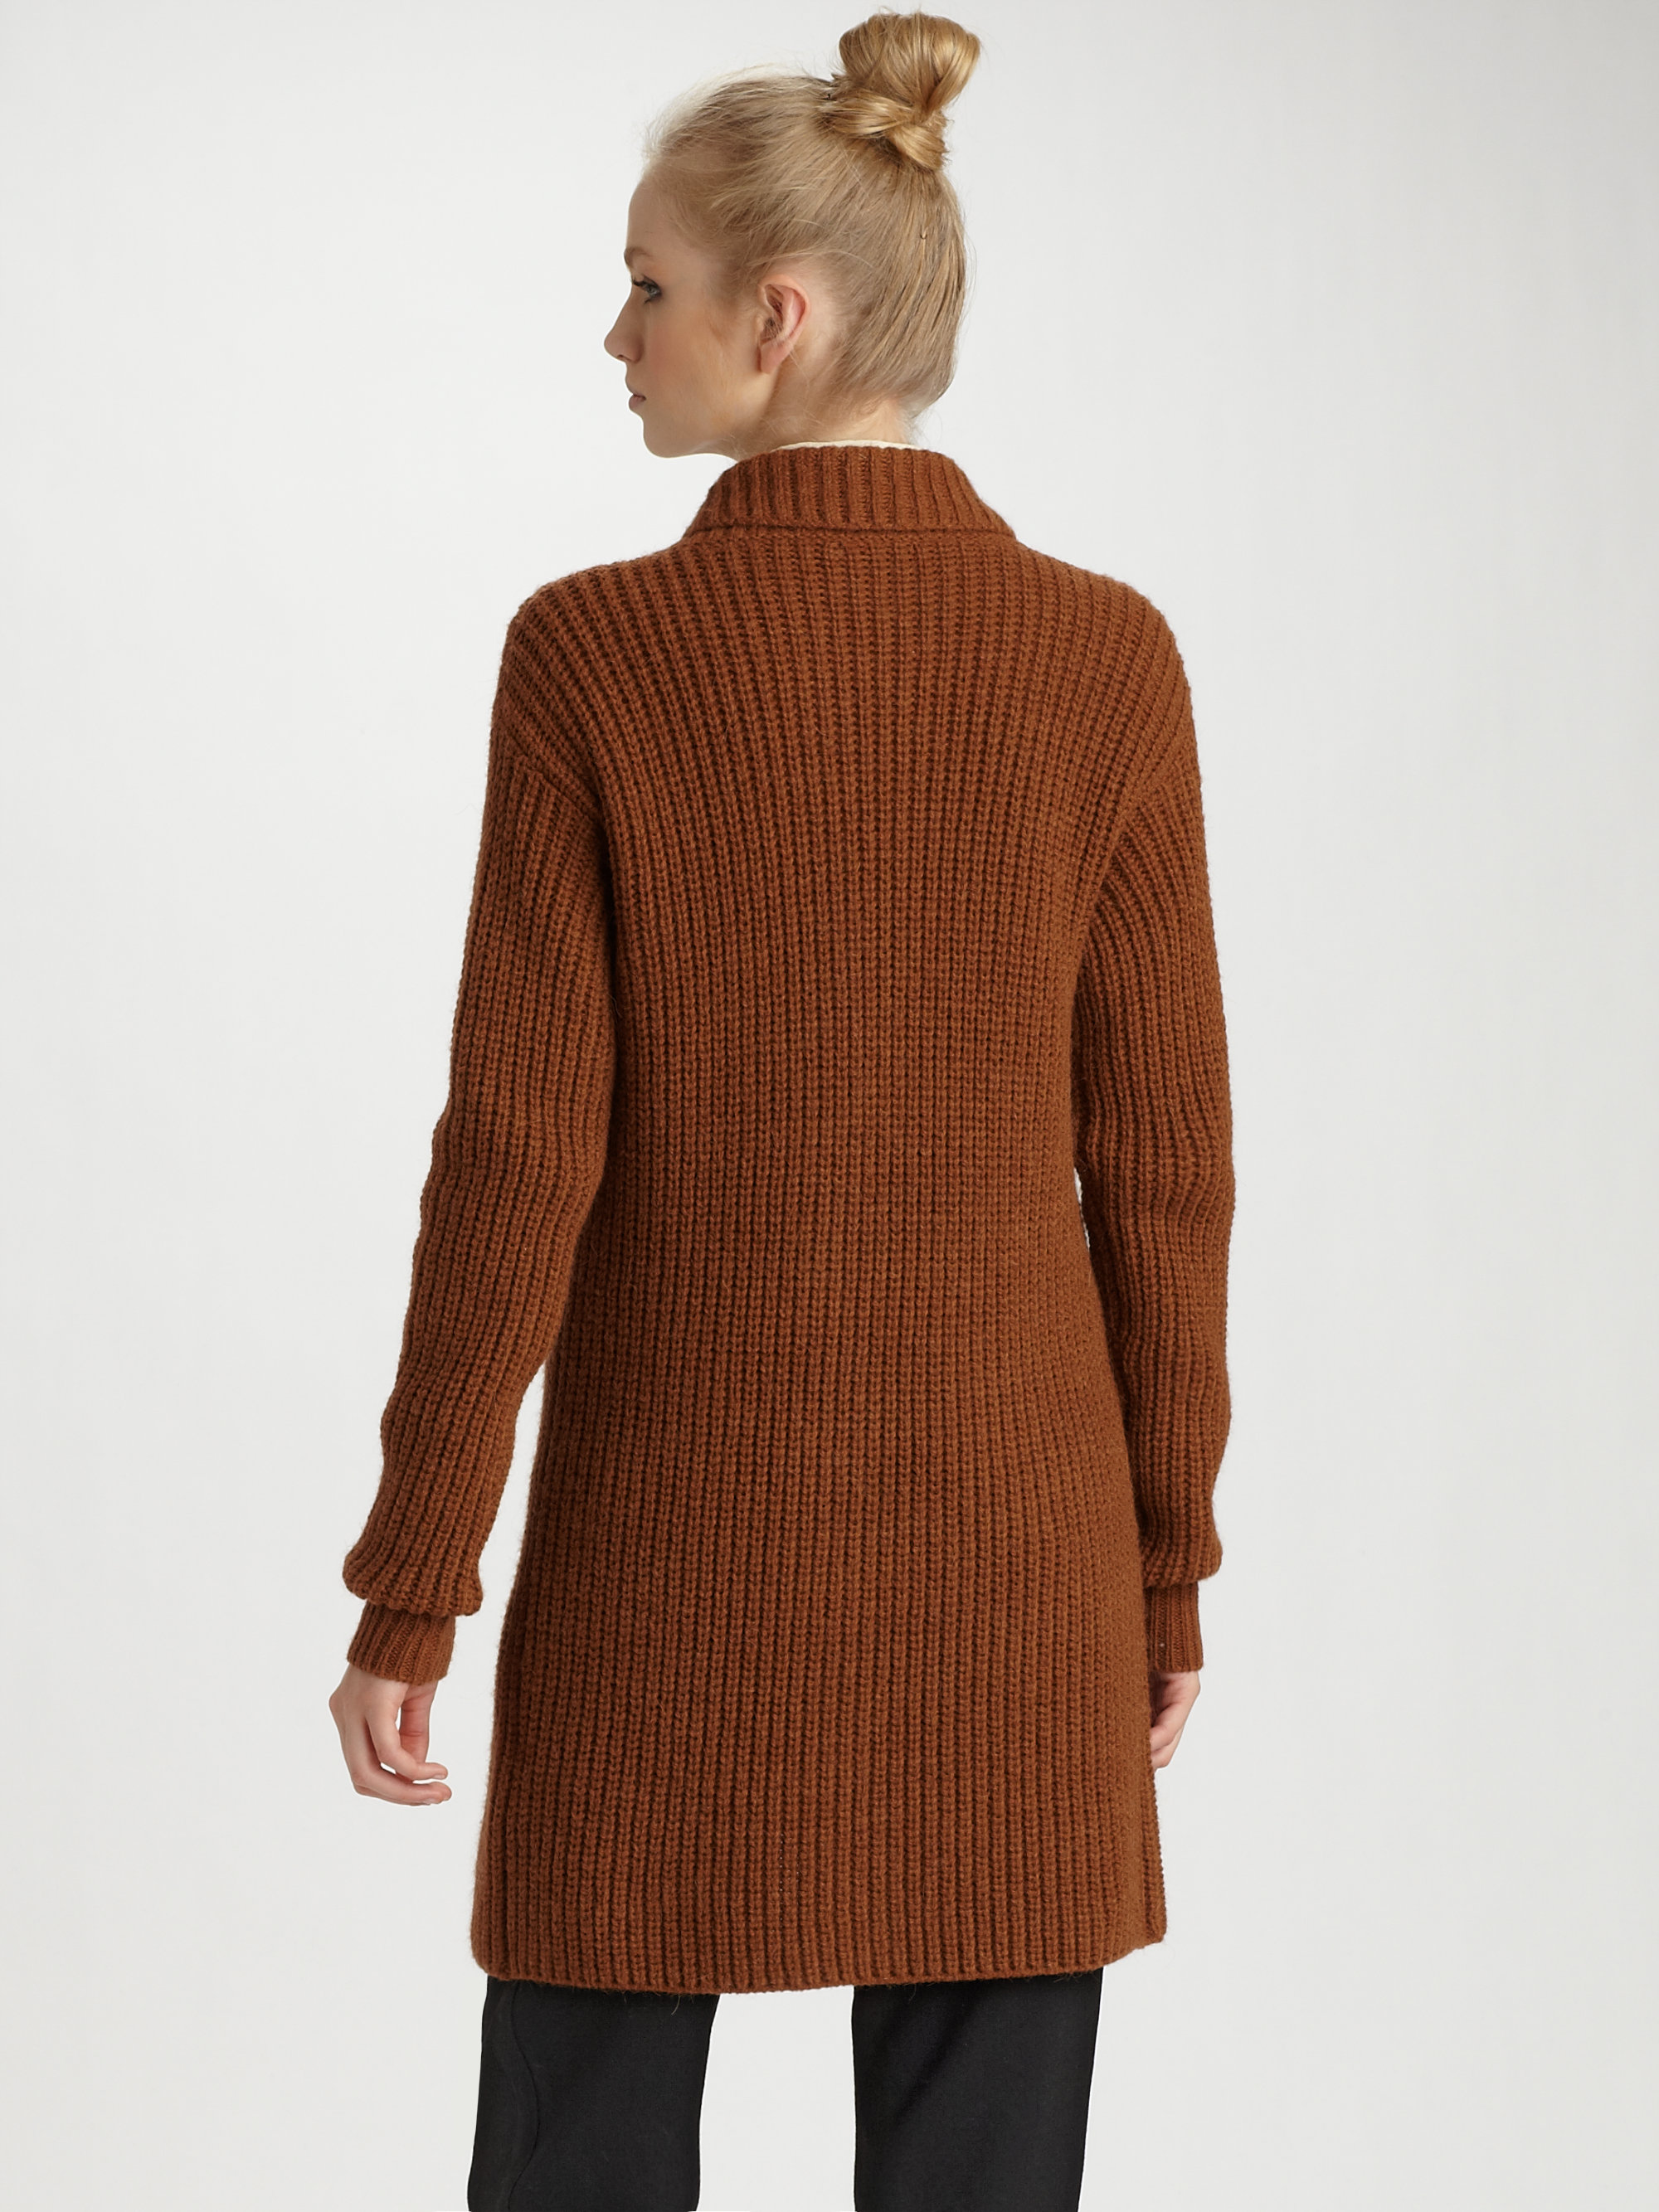 handbags chloe online - see-by-chloe-rust-alpaca-long-cardigan-product-2-7675627-542785070.jpeg